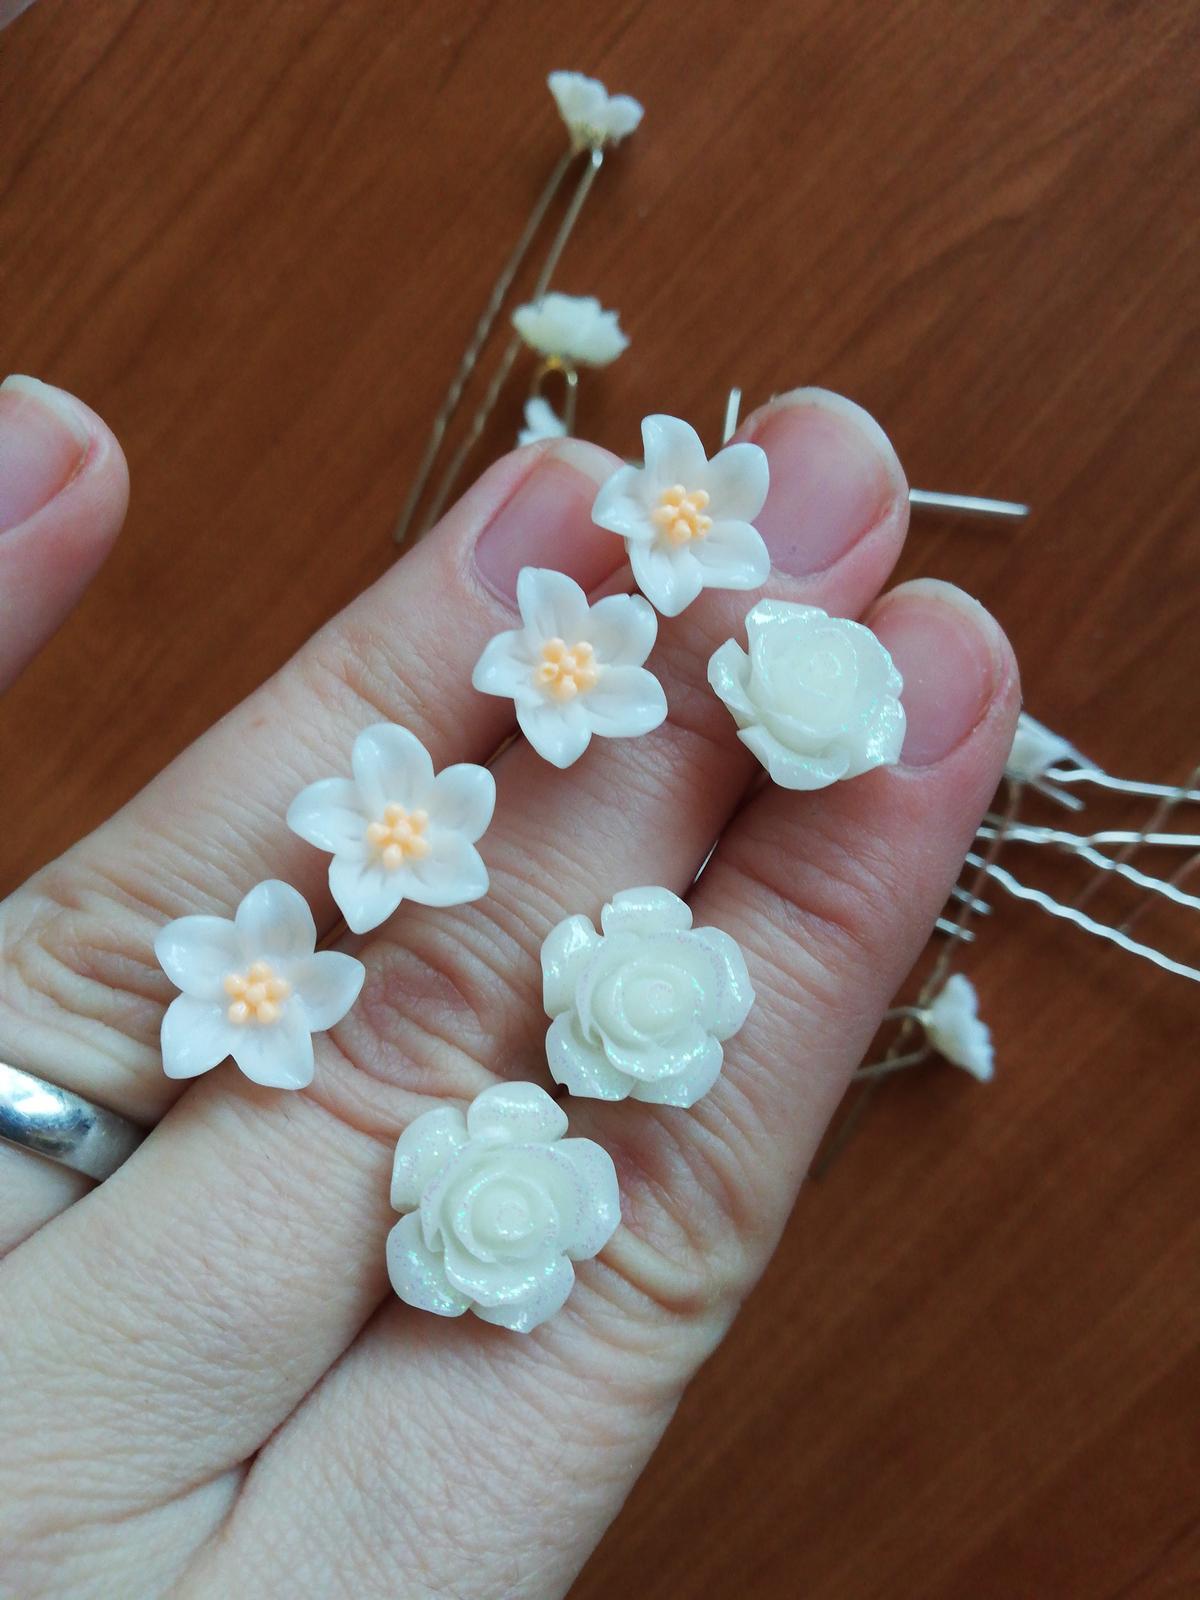 vlásenky bíly květ , sponky - Obrázek č. 1